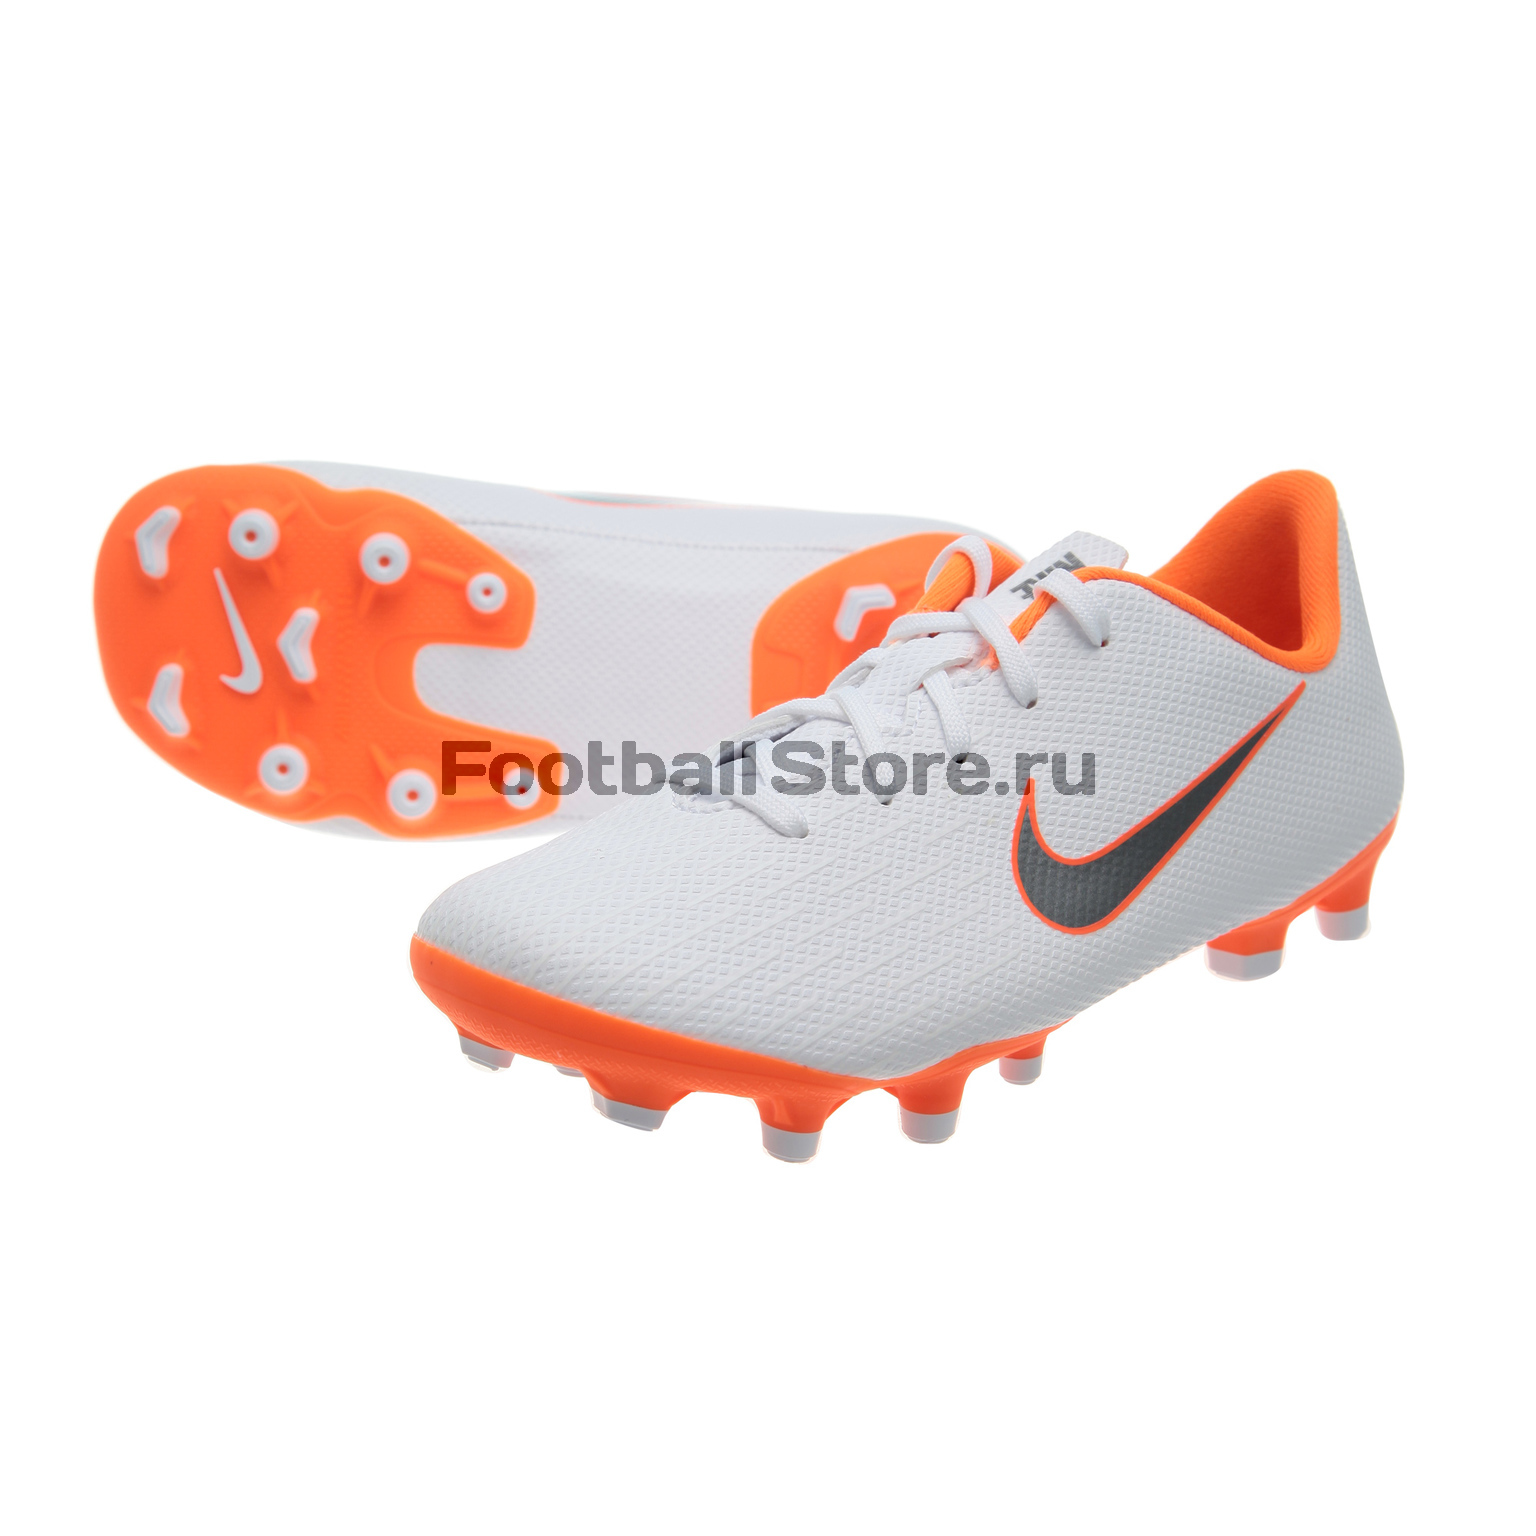 Бутсы детские Nike Vapor 12 Academy PS FG/MG AH7349-107 бутсы nike mercurial victory iii fg 509128 800